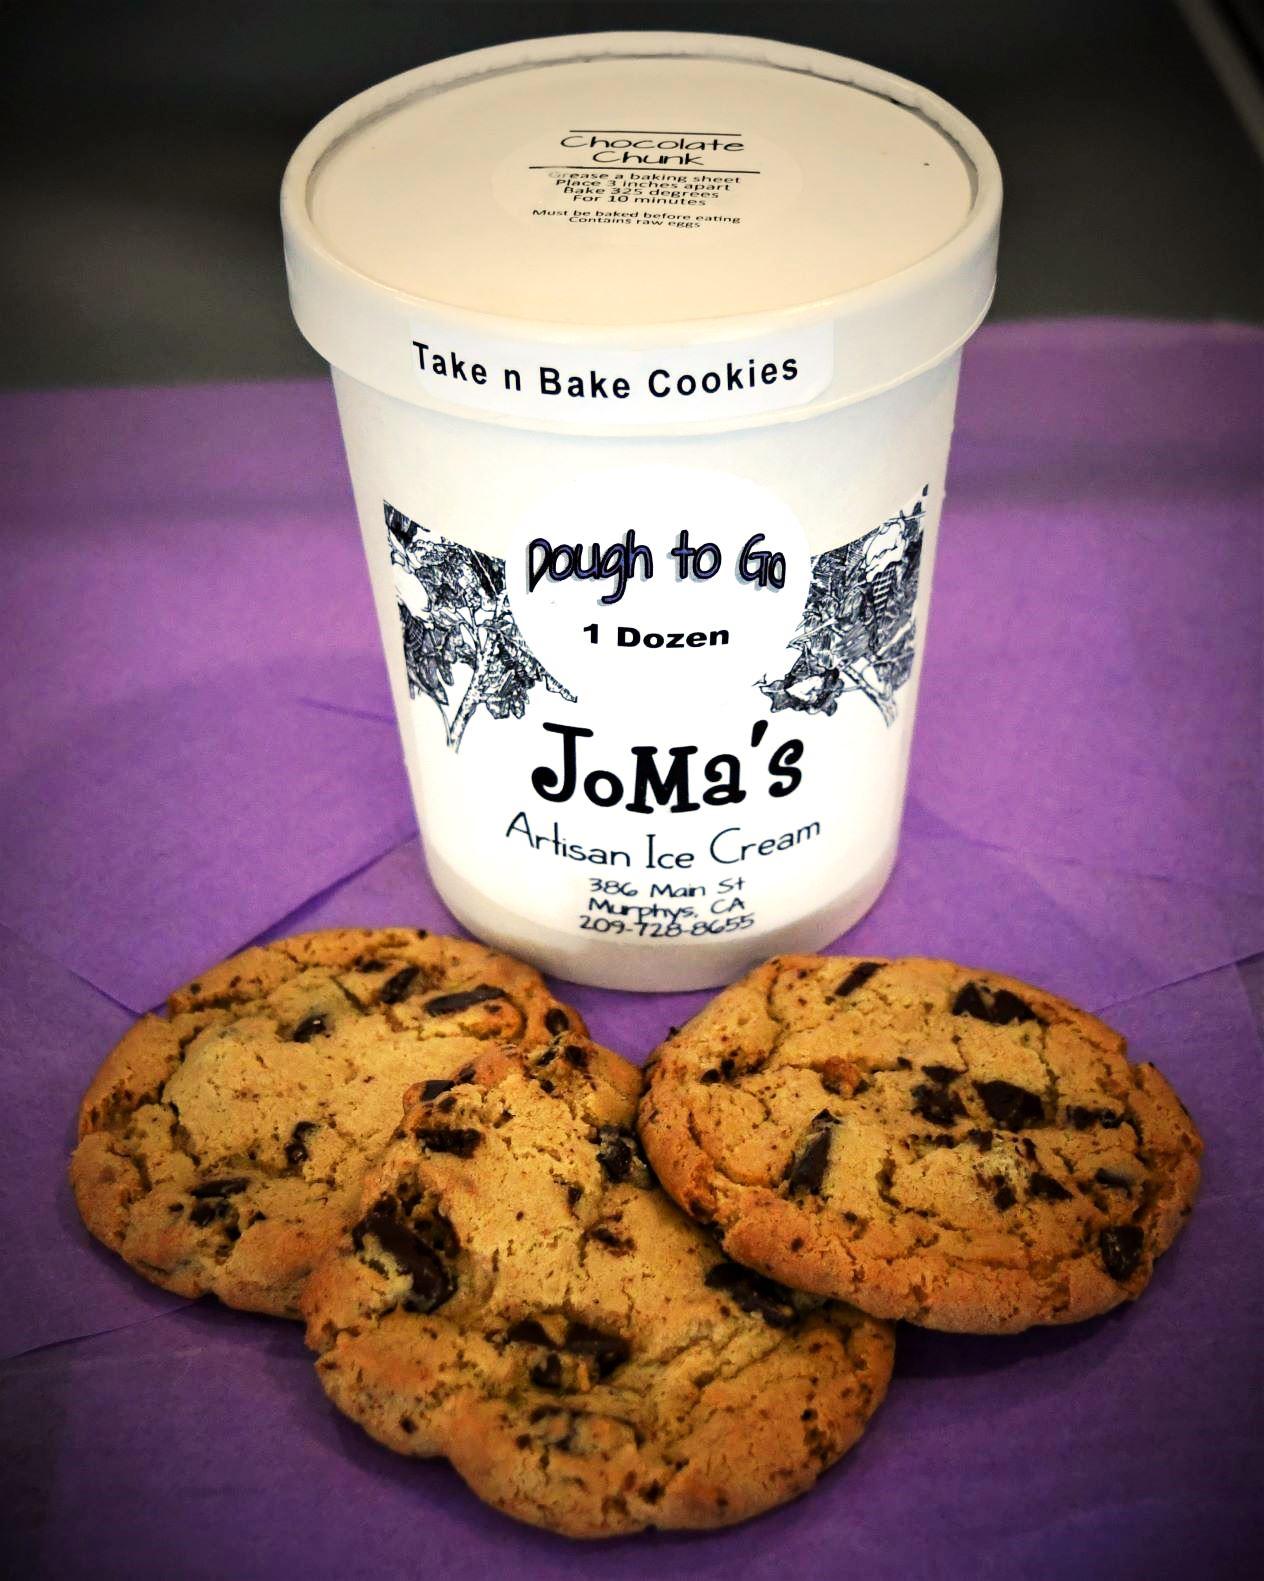 JoMa's Dough to Go